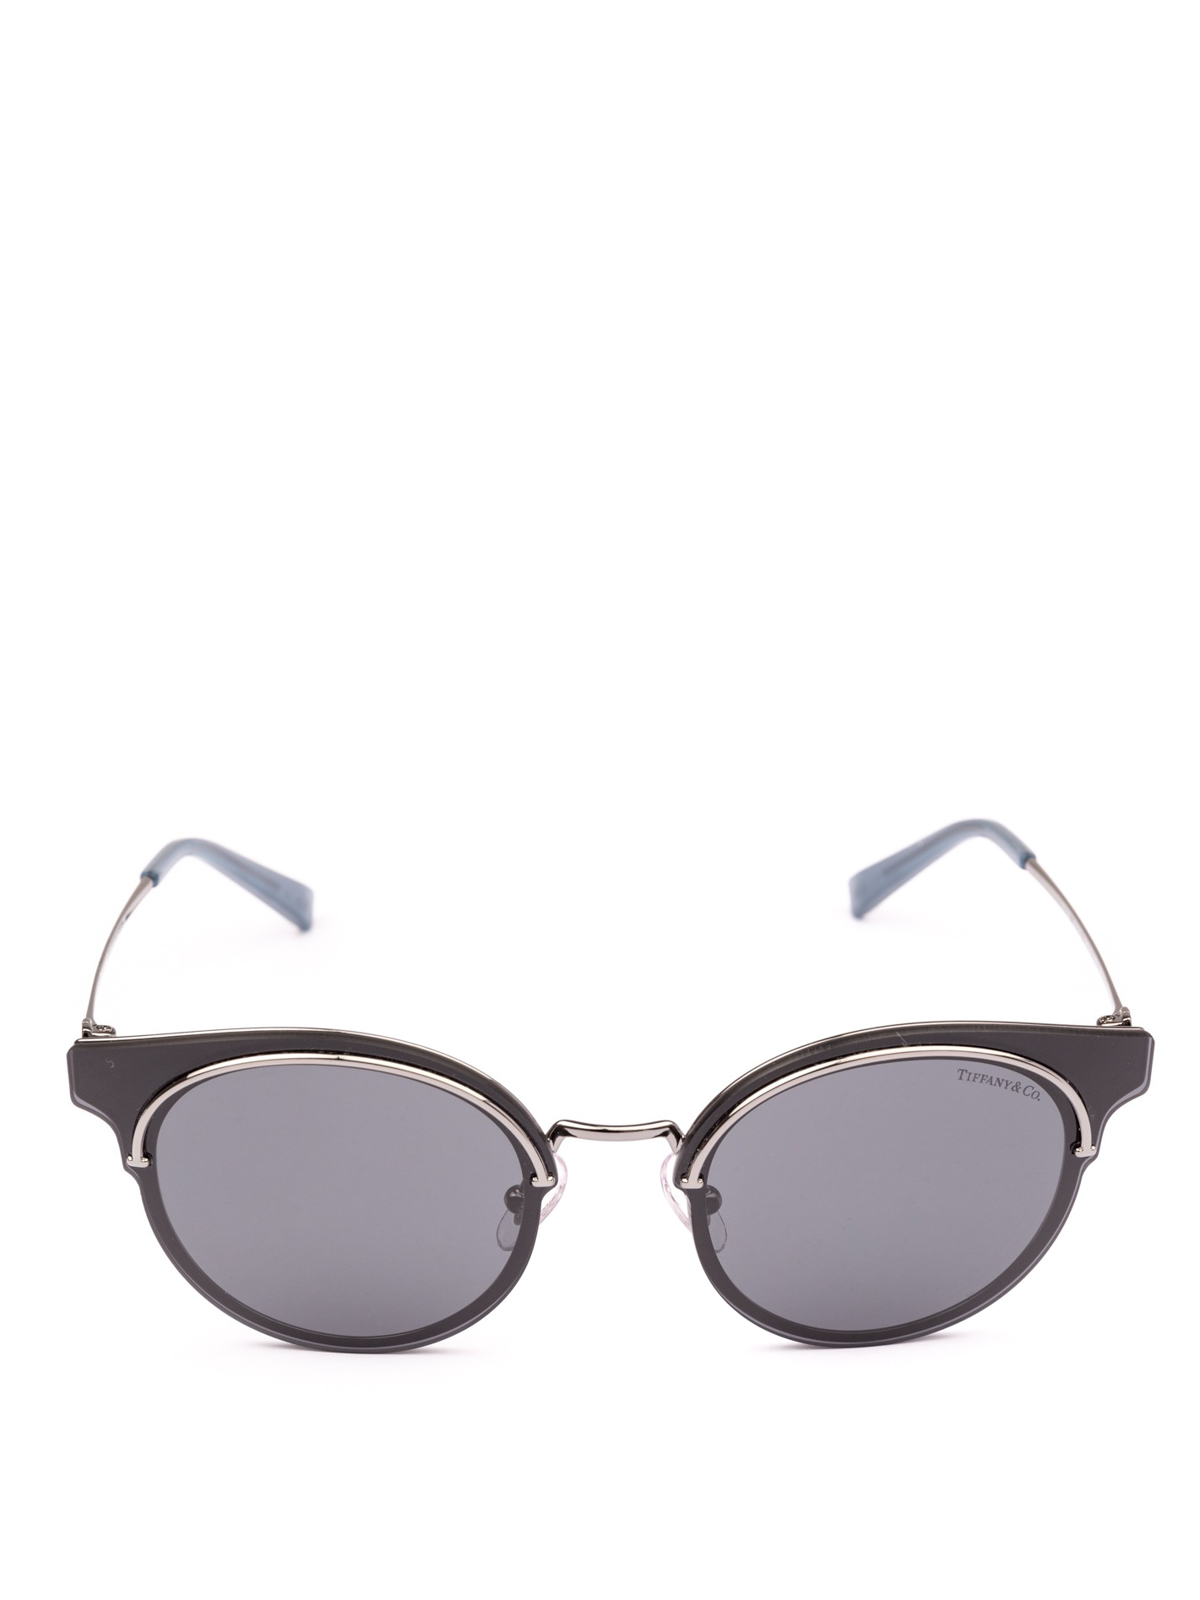 649bfdc8438 Tiffany   Co. - Grey lens round sunglasses - sunglasses - TF3061 6003 3